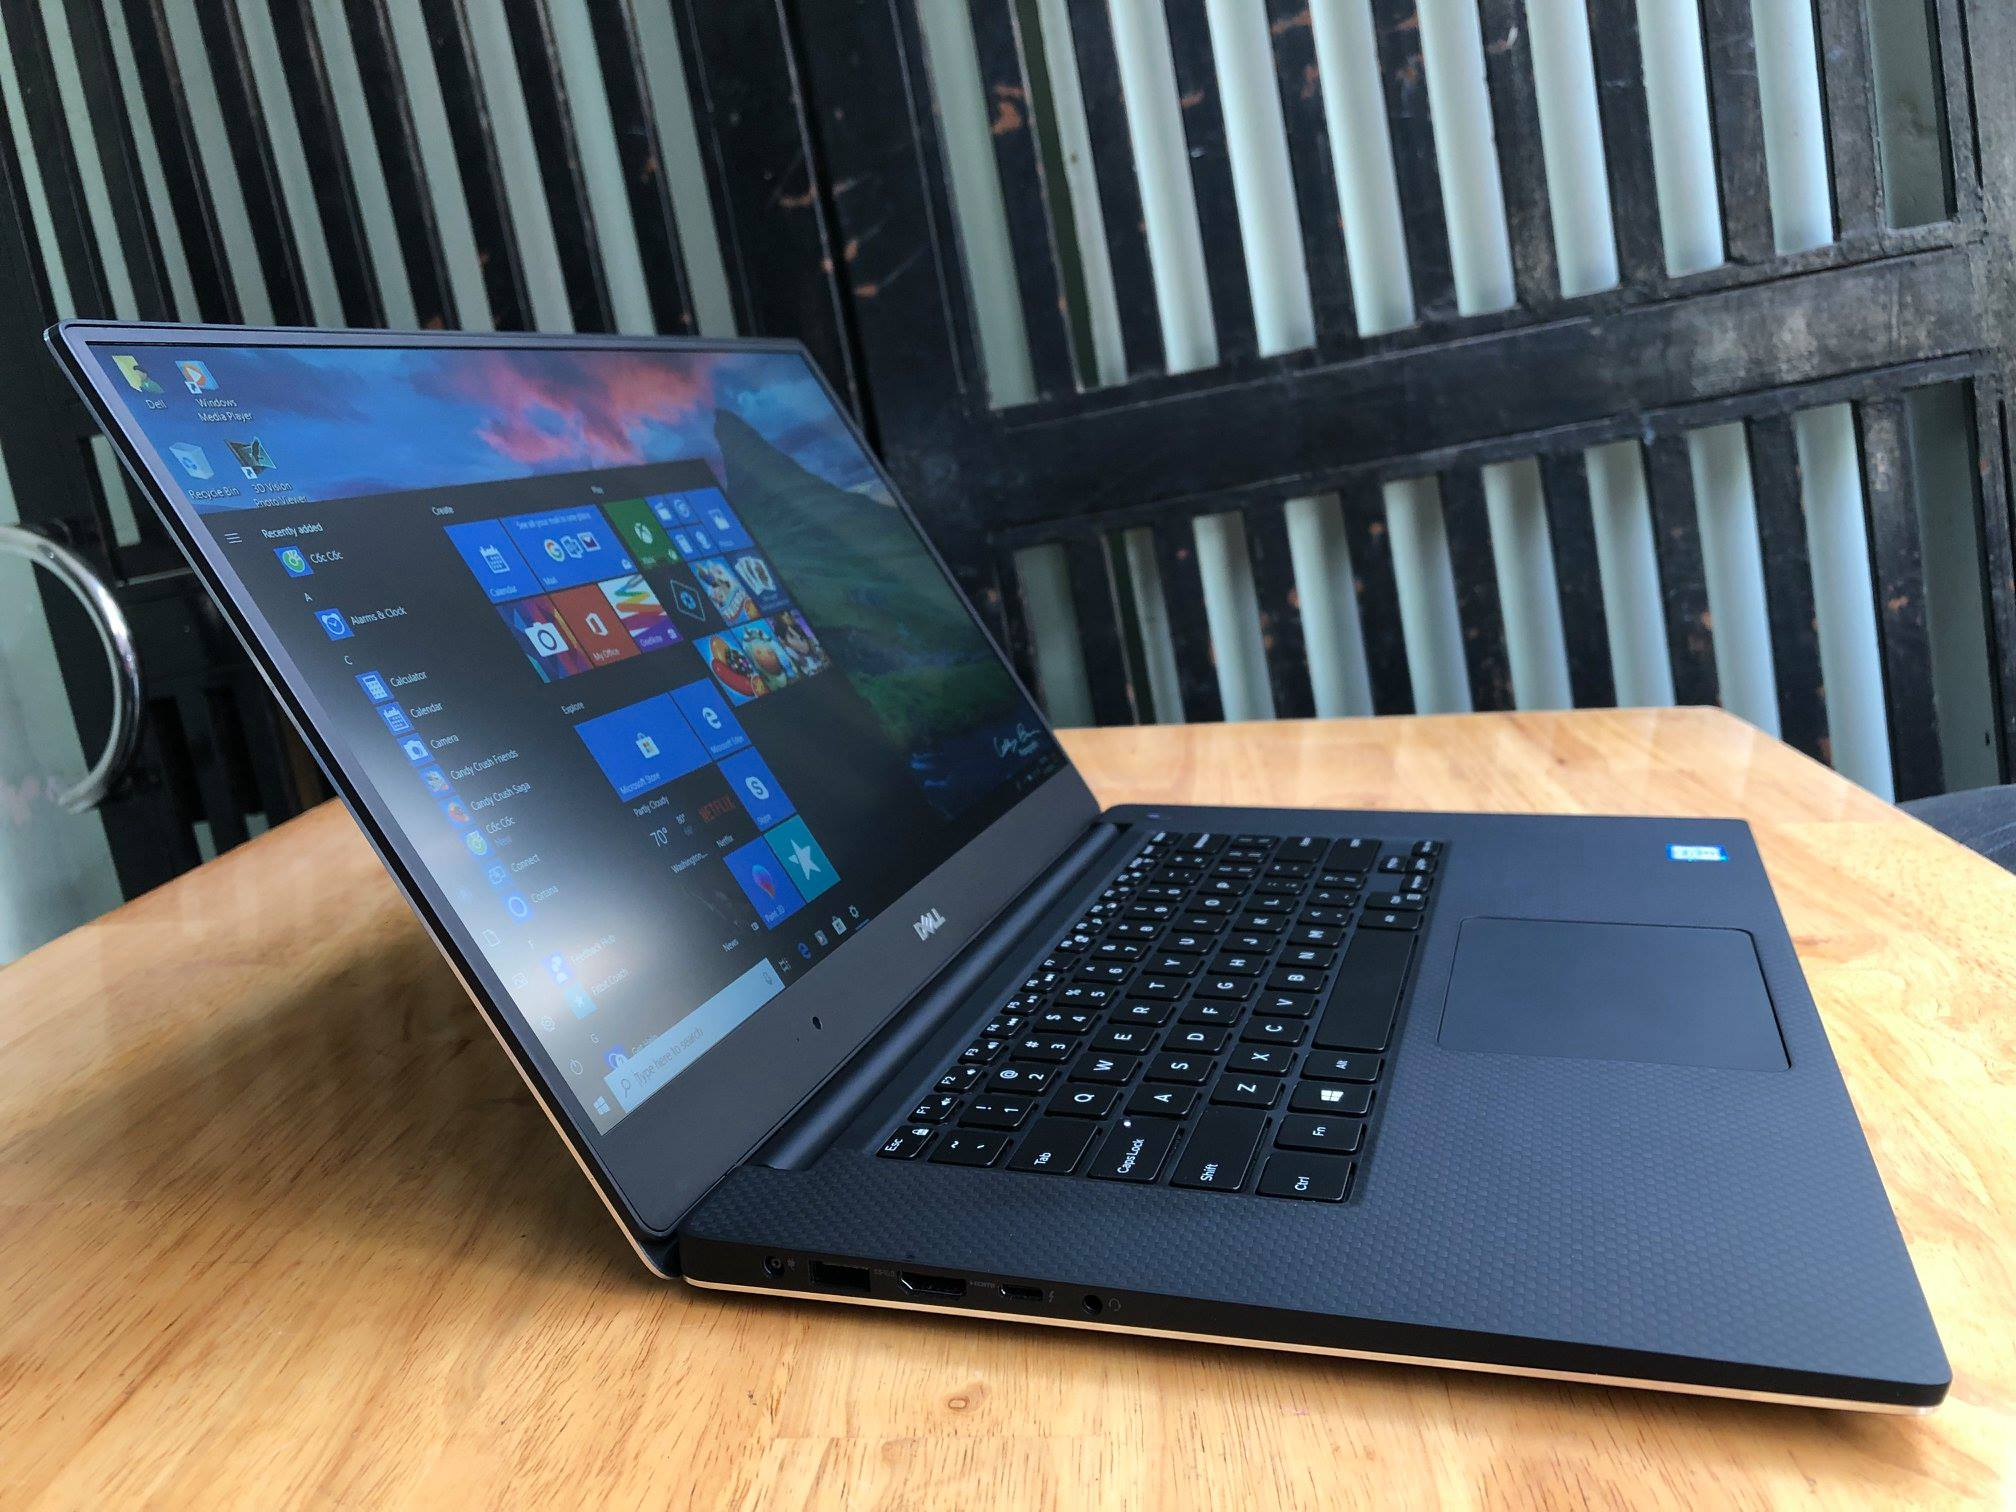 ==> bán 50 cái laptop Dell ... Core i3, i5, i7 ...máy đẹp, zin all. - 5